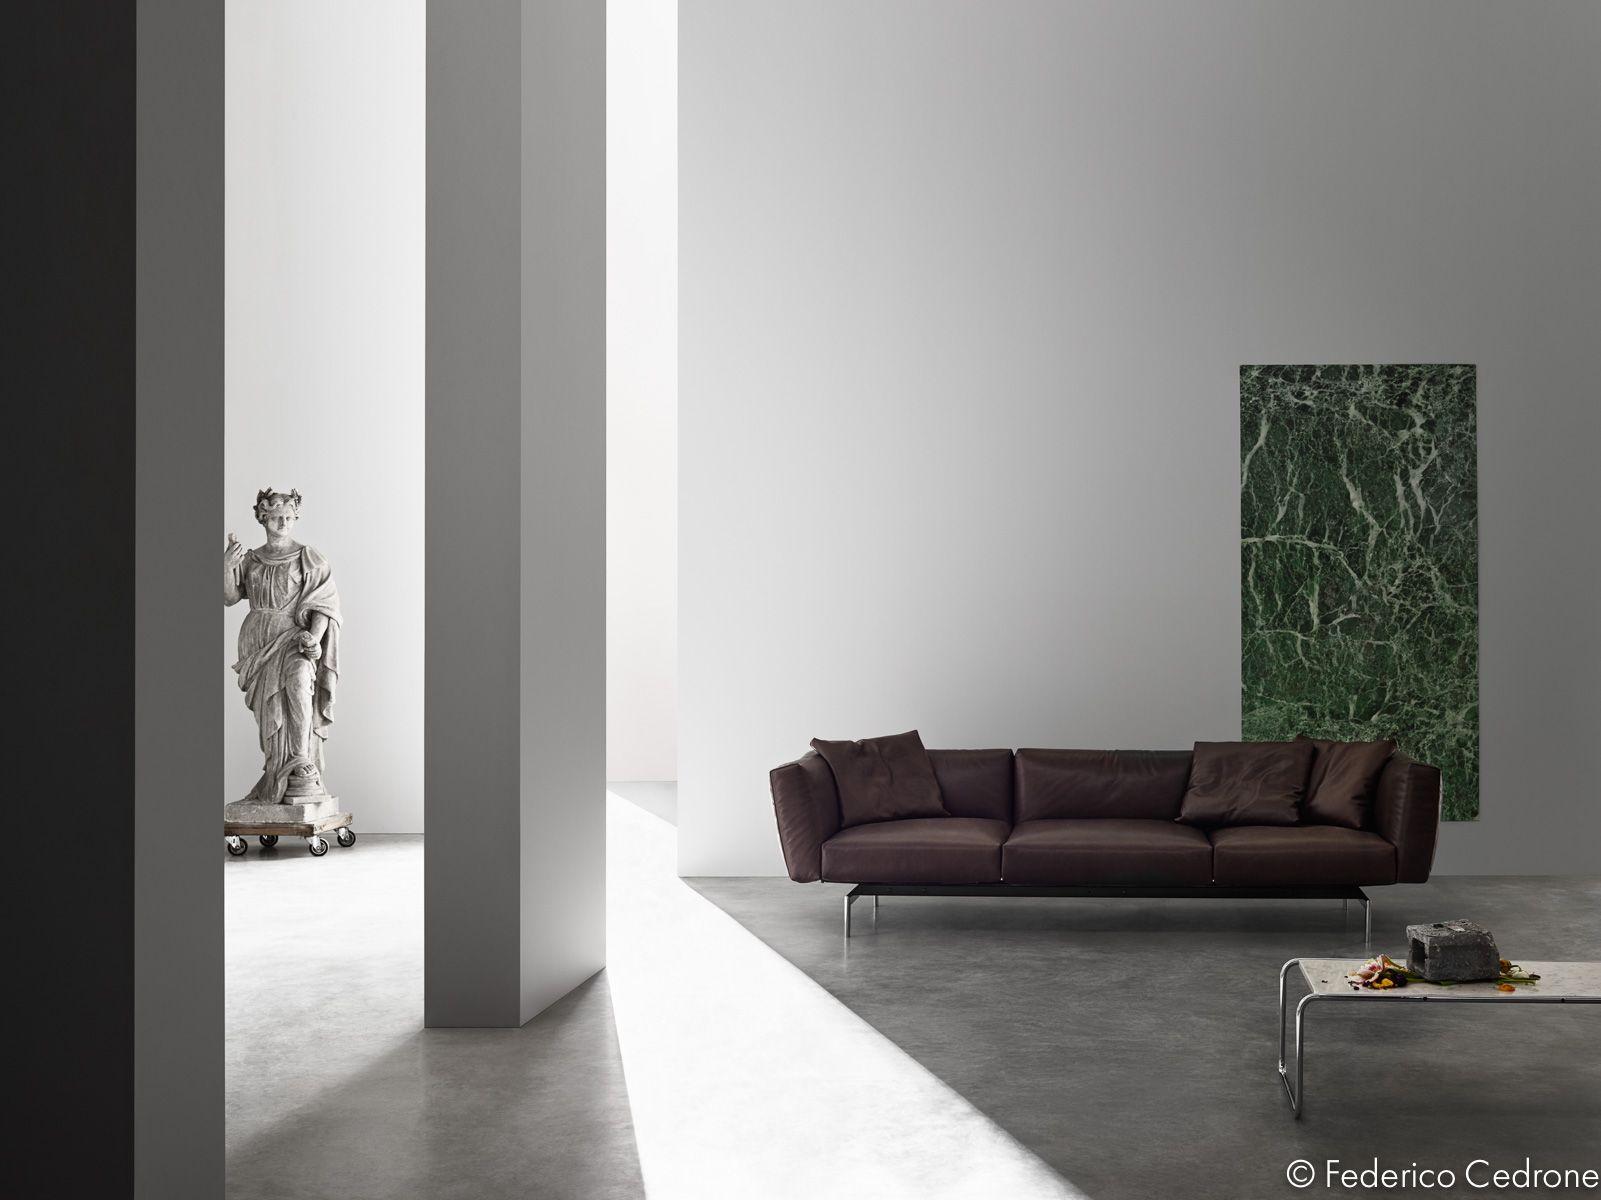 Knoll Sedie ~ Knoll #2 u2013 federico cedrone photographer case sedie divani